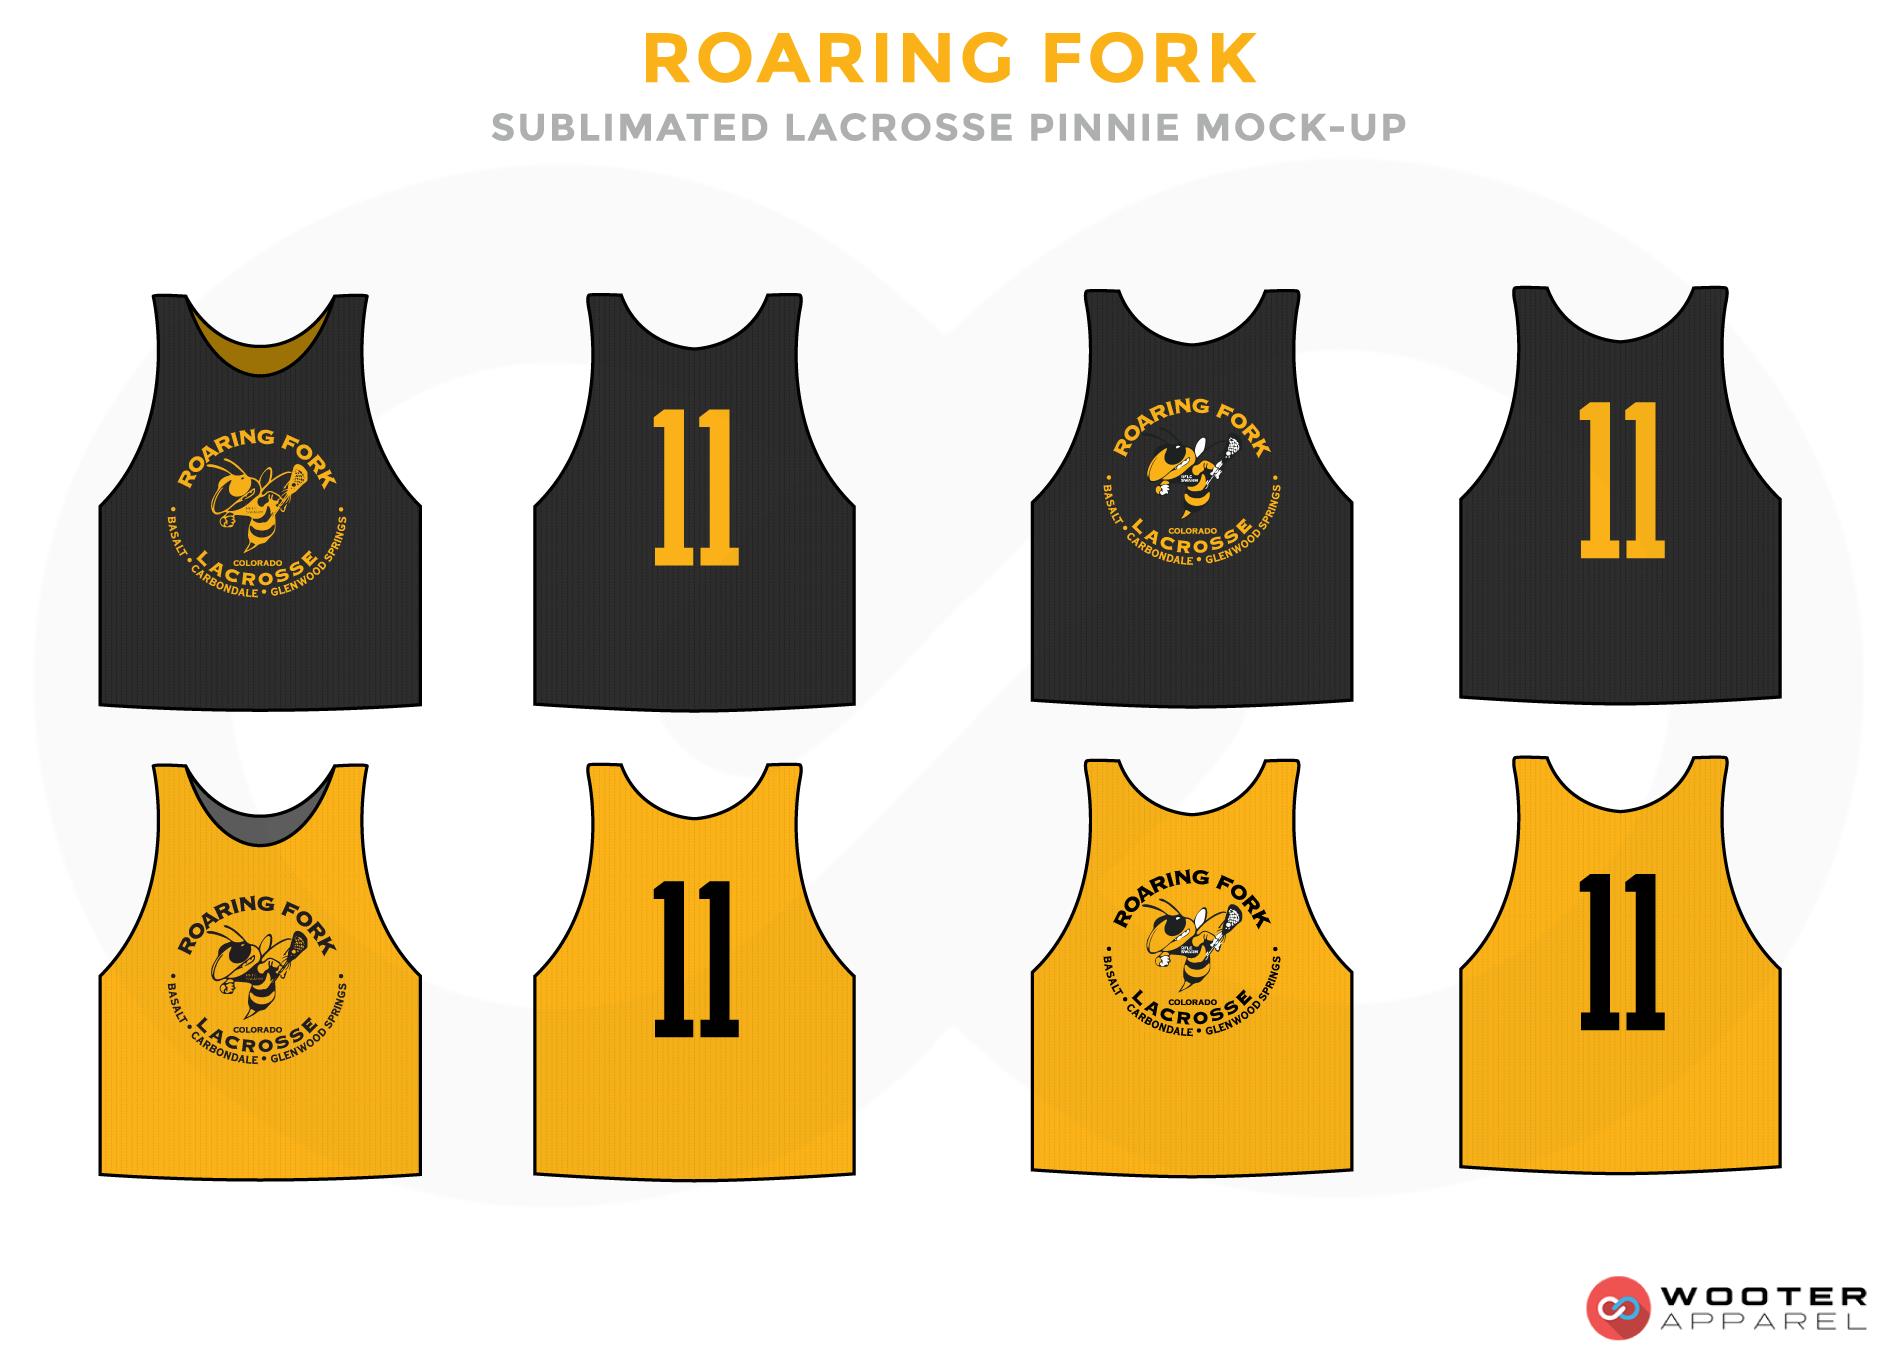 Roaring Fork Black and Yellow Lacrosse Uniforms, Reversible Pinnies, Jerseys